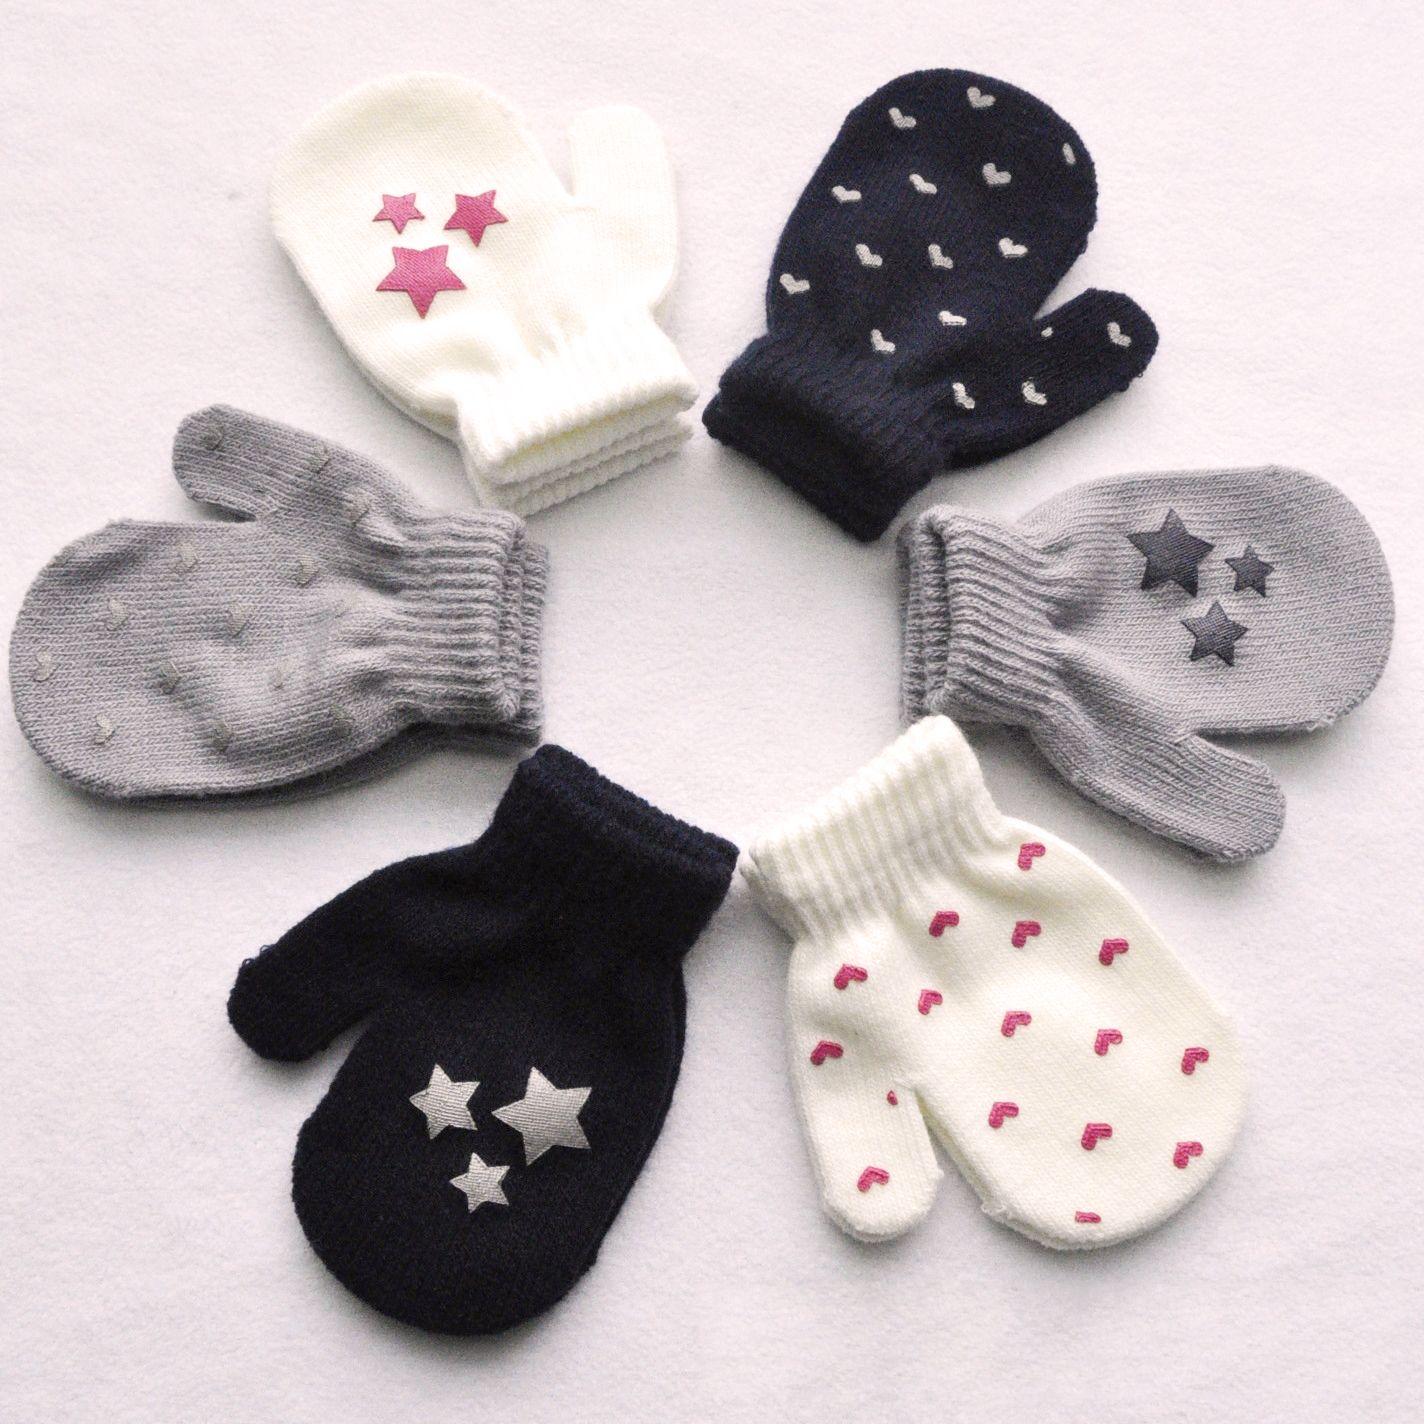 Großhandel Winter Herbst Baby Häkeln Warme Handschuhe 5 Sterne